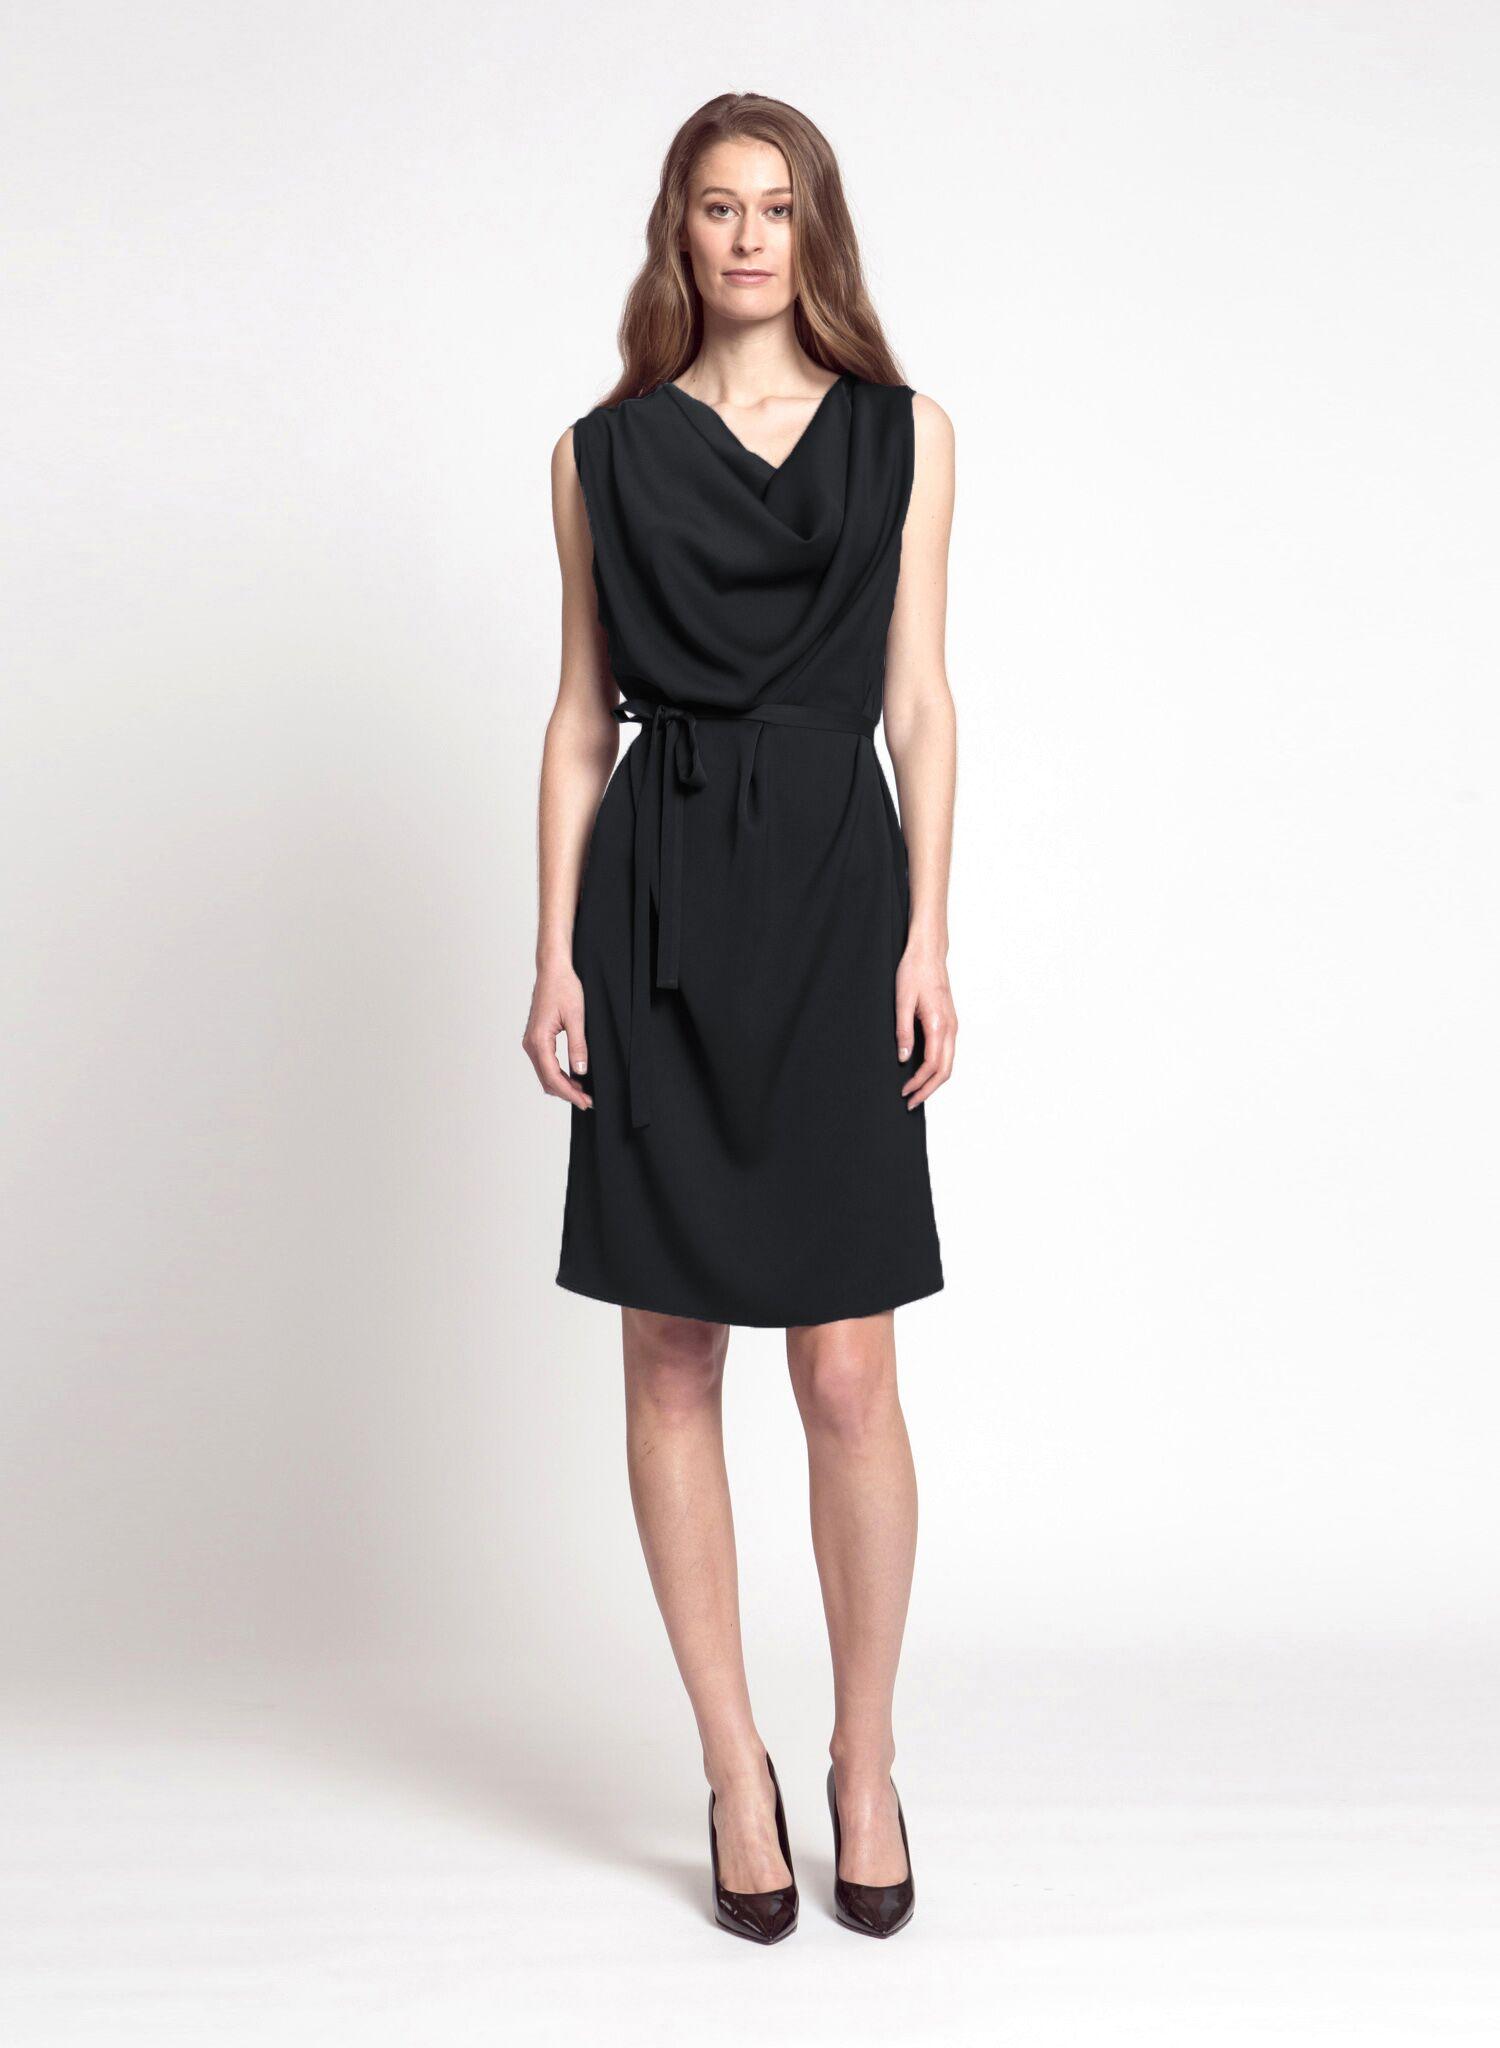 Katri Niskanen Juhlamekko, Thelma Dress Musta